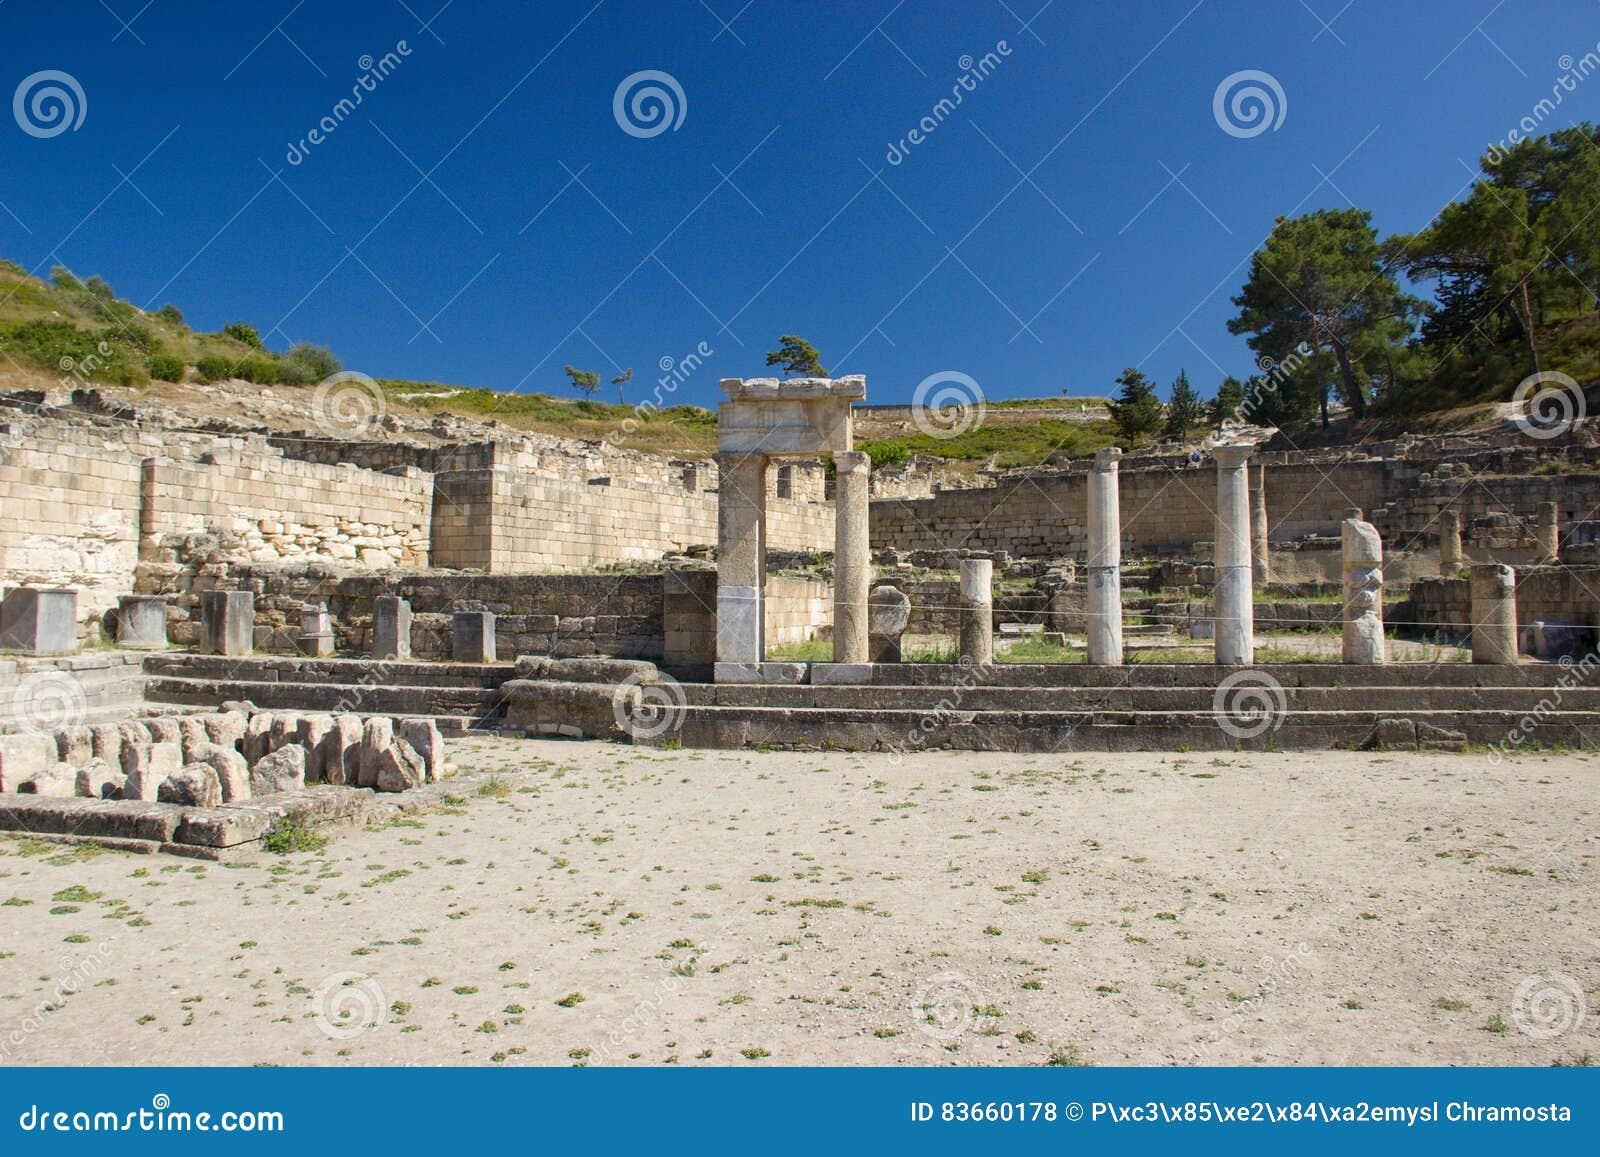 Antyczna Kamiros Rhodos Grecja architektura historyczna